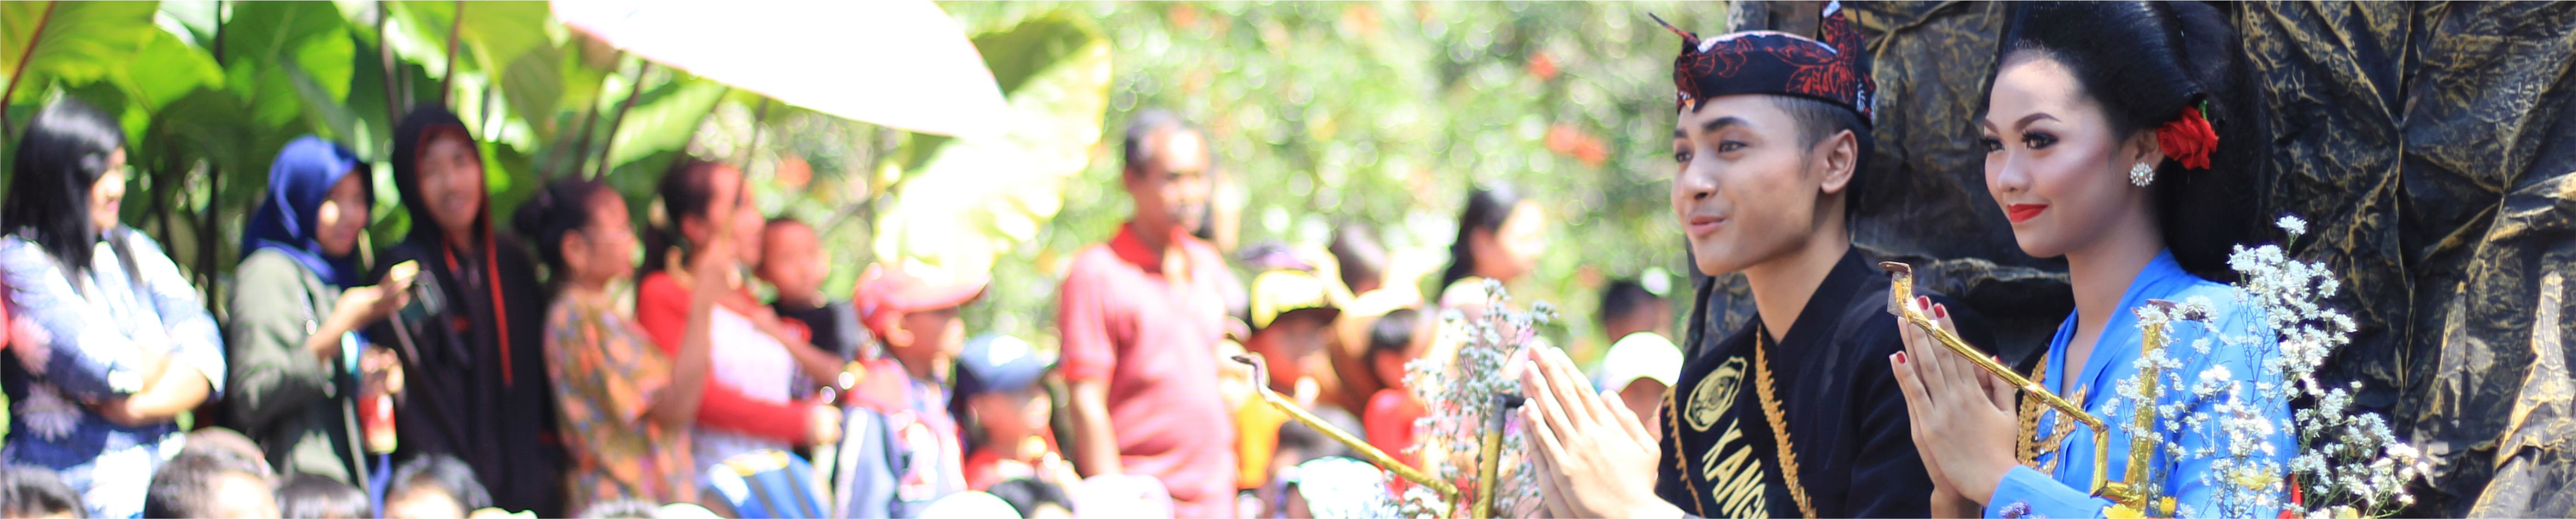 Situs Resmi Pemerintah Kabupaten Nganjuk Monumen Geriliya Jenderal Sudirman Kab